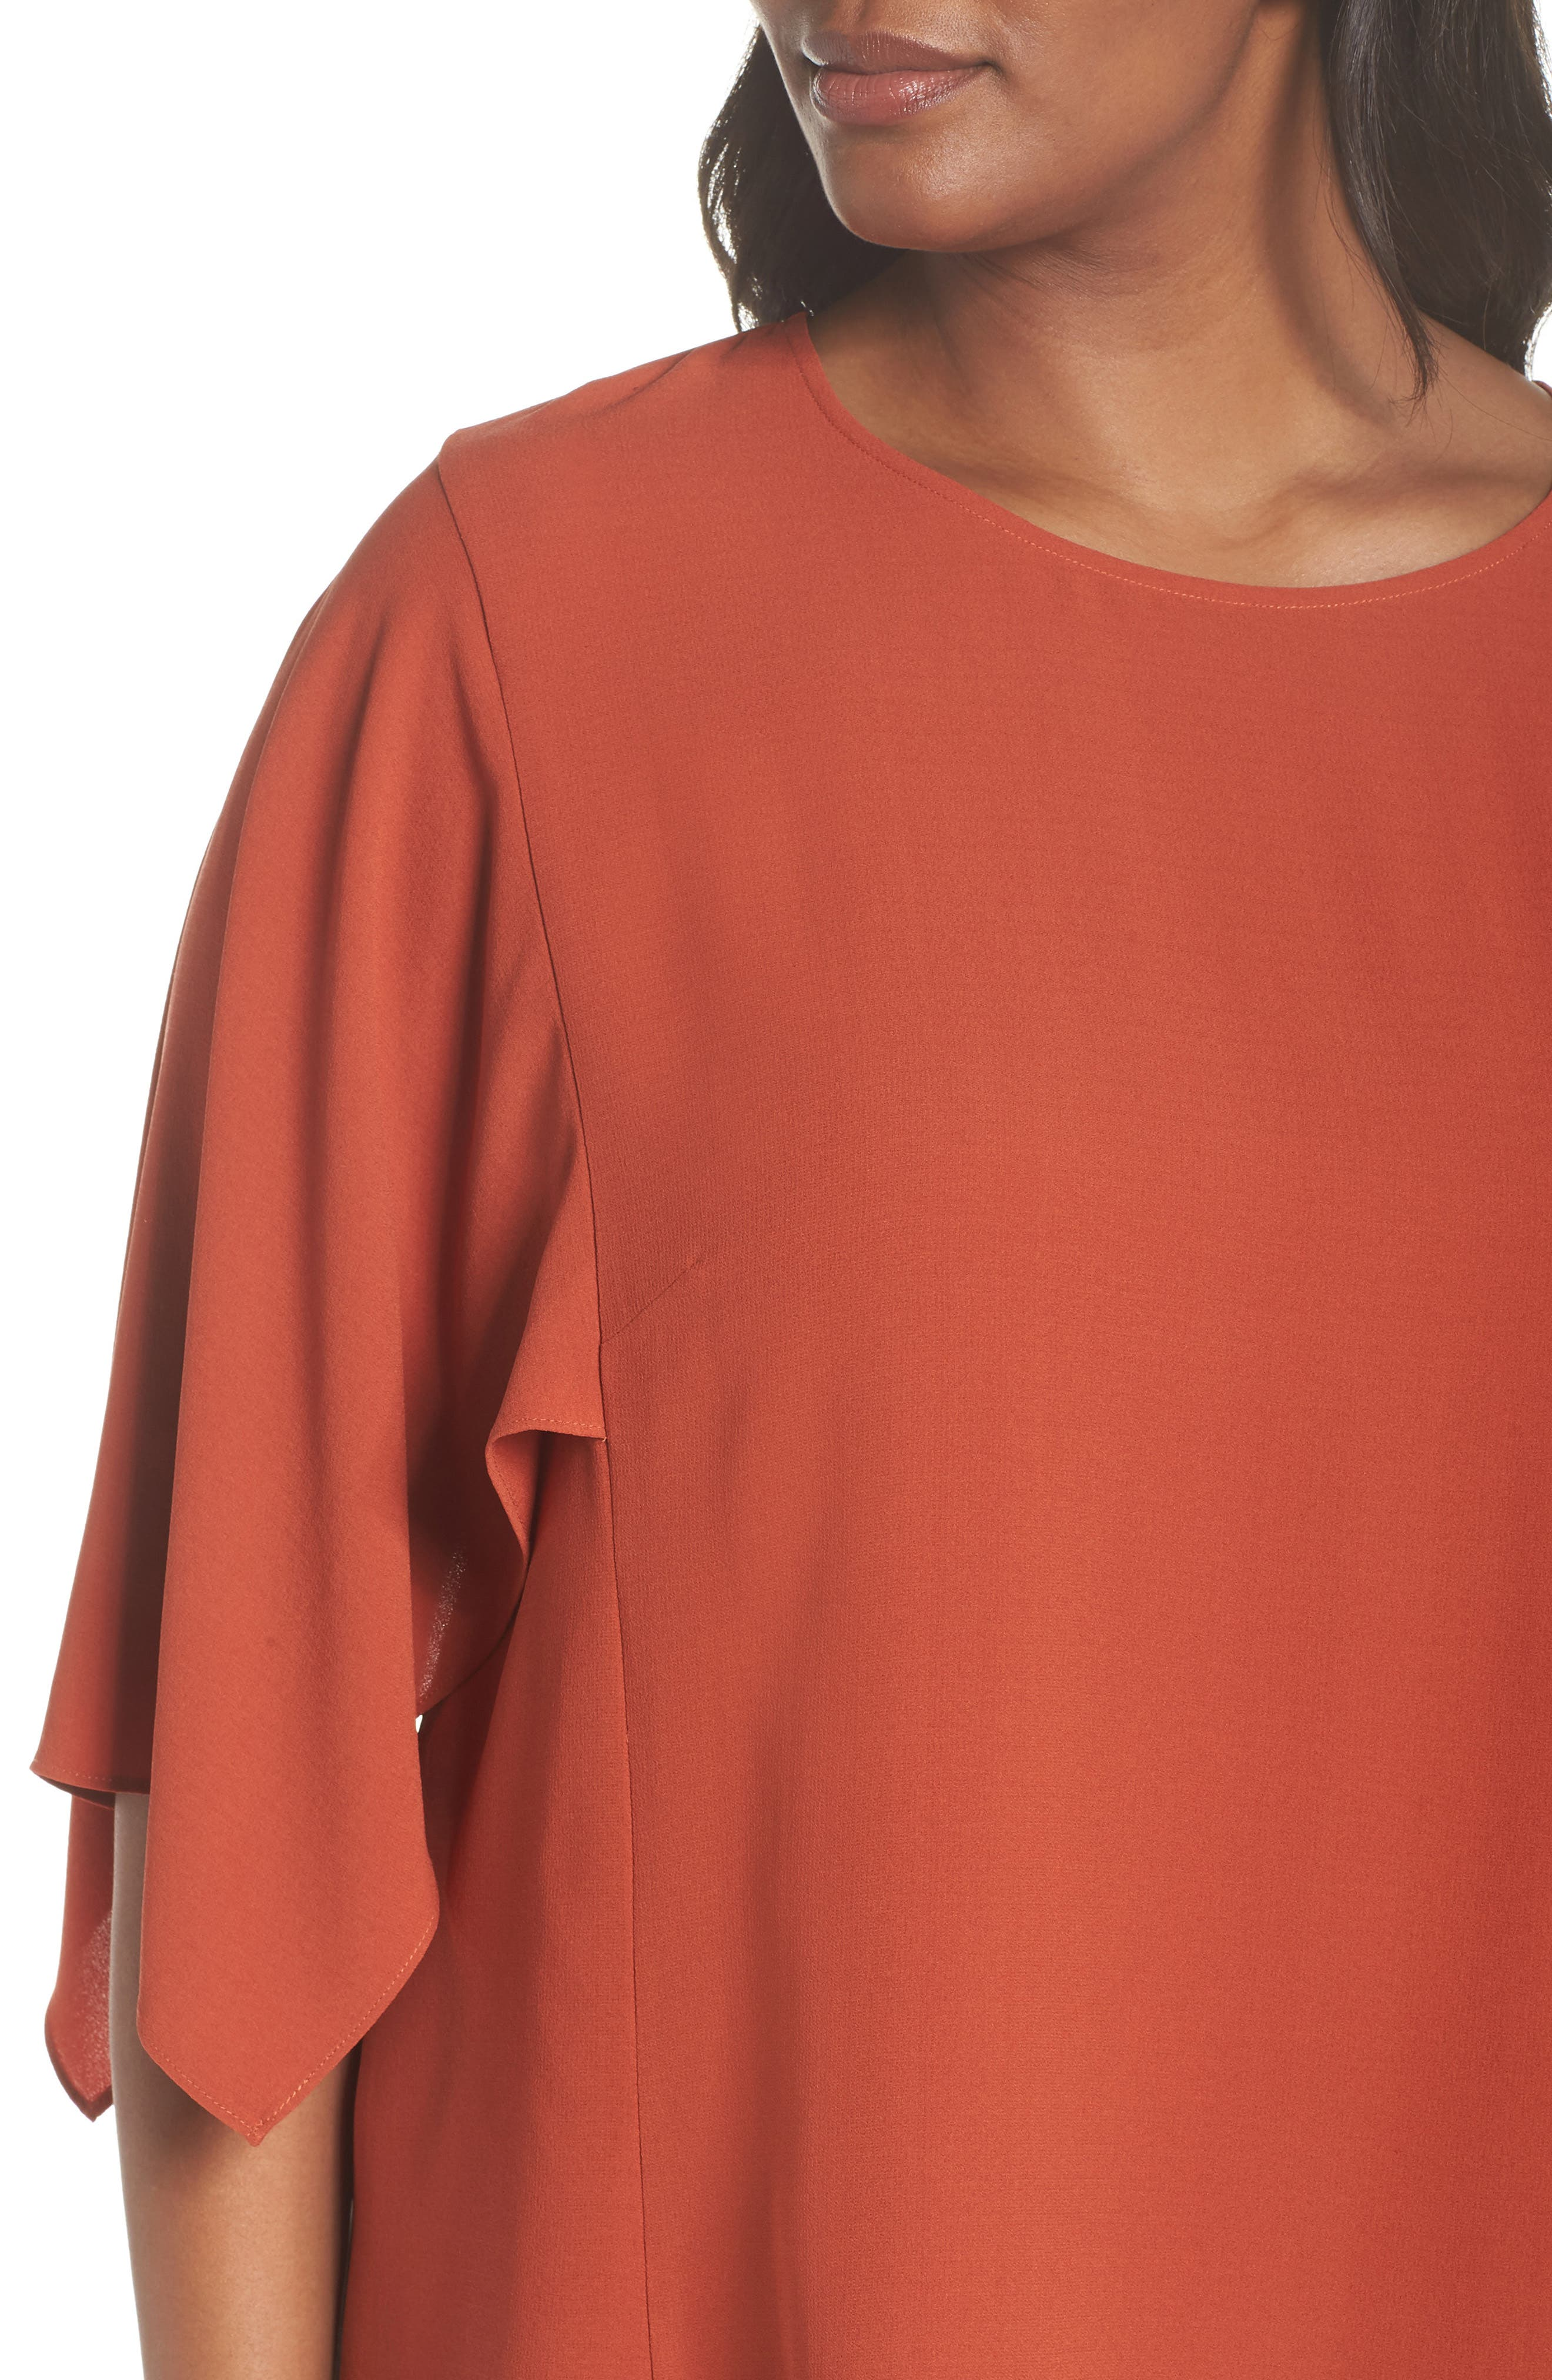 Slit Sleeve Silk Top,                             Alternate thumbnail 4, color,                             ORANGE PEKOE